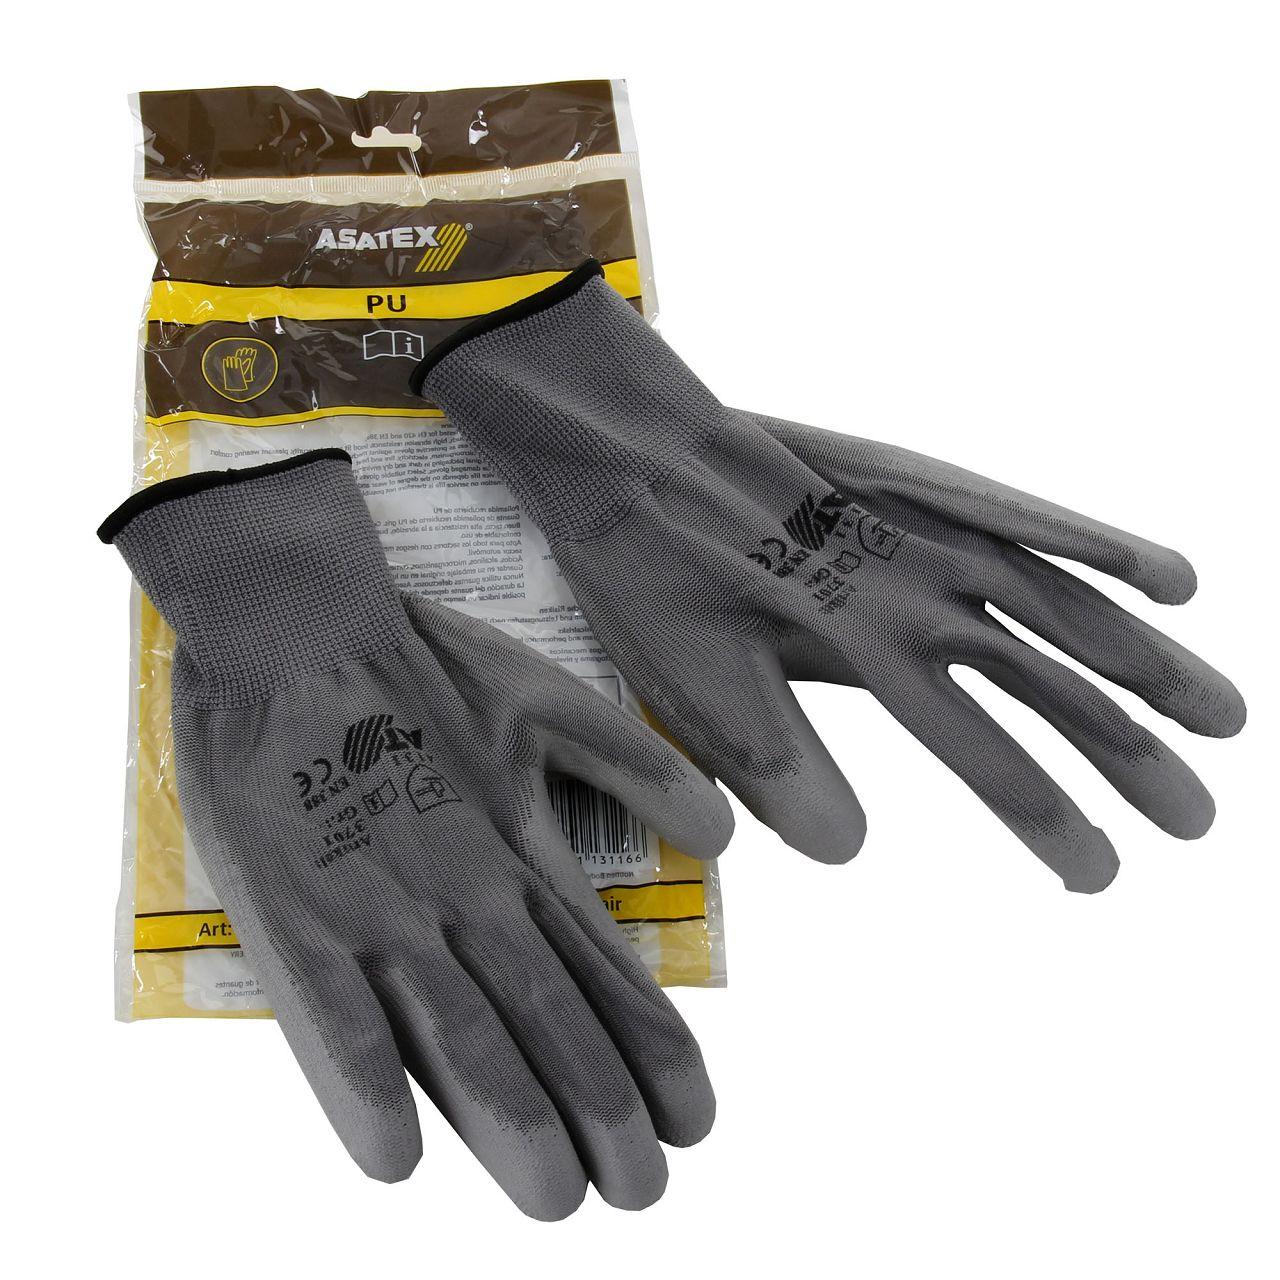 ASATEX 3701 Handschuhe Arbeitshandschuhe GUMMIERT - GRAU Größe 10 / XL (1 Paar)